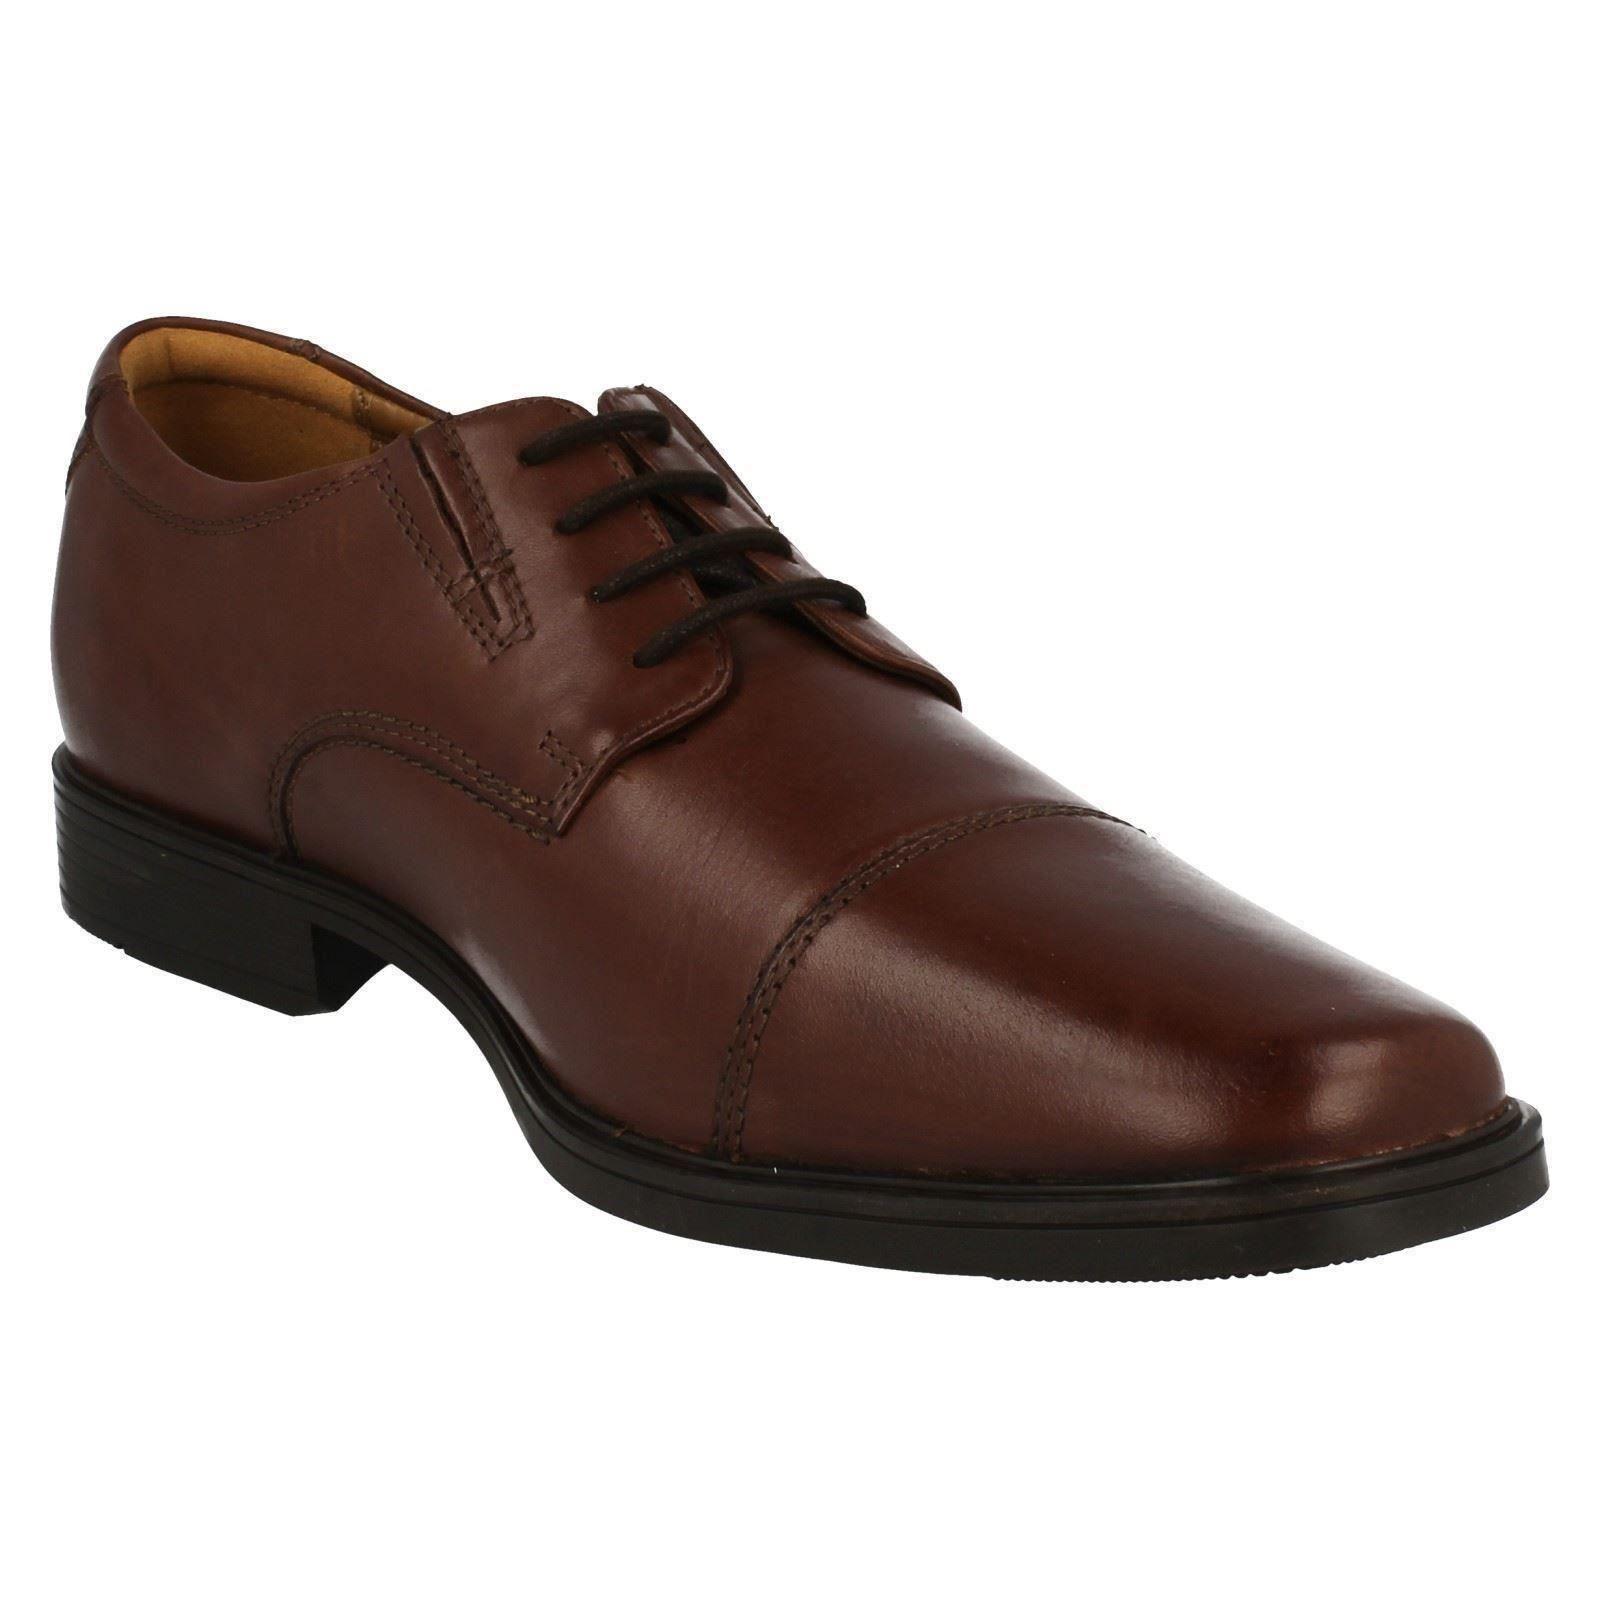 Uomo Clarks Schuhes Tilden Cap Cap Tilden 1ac377